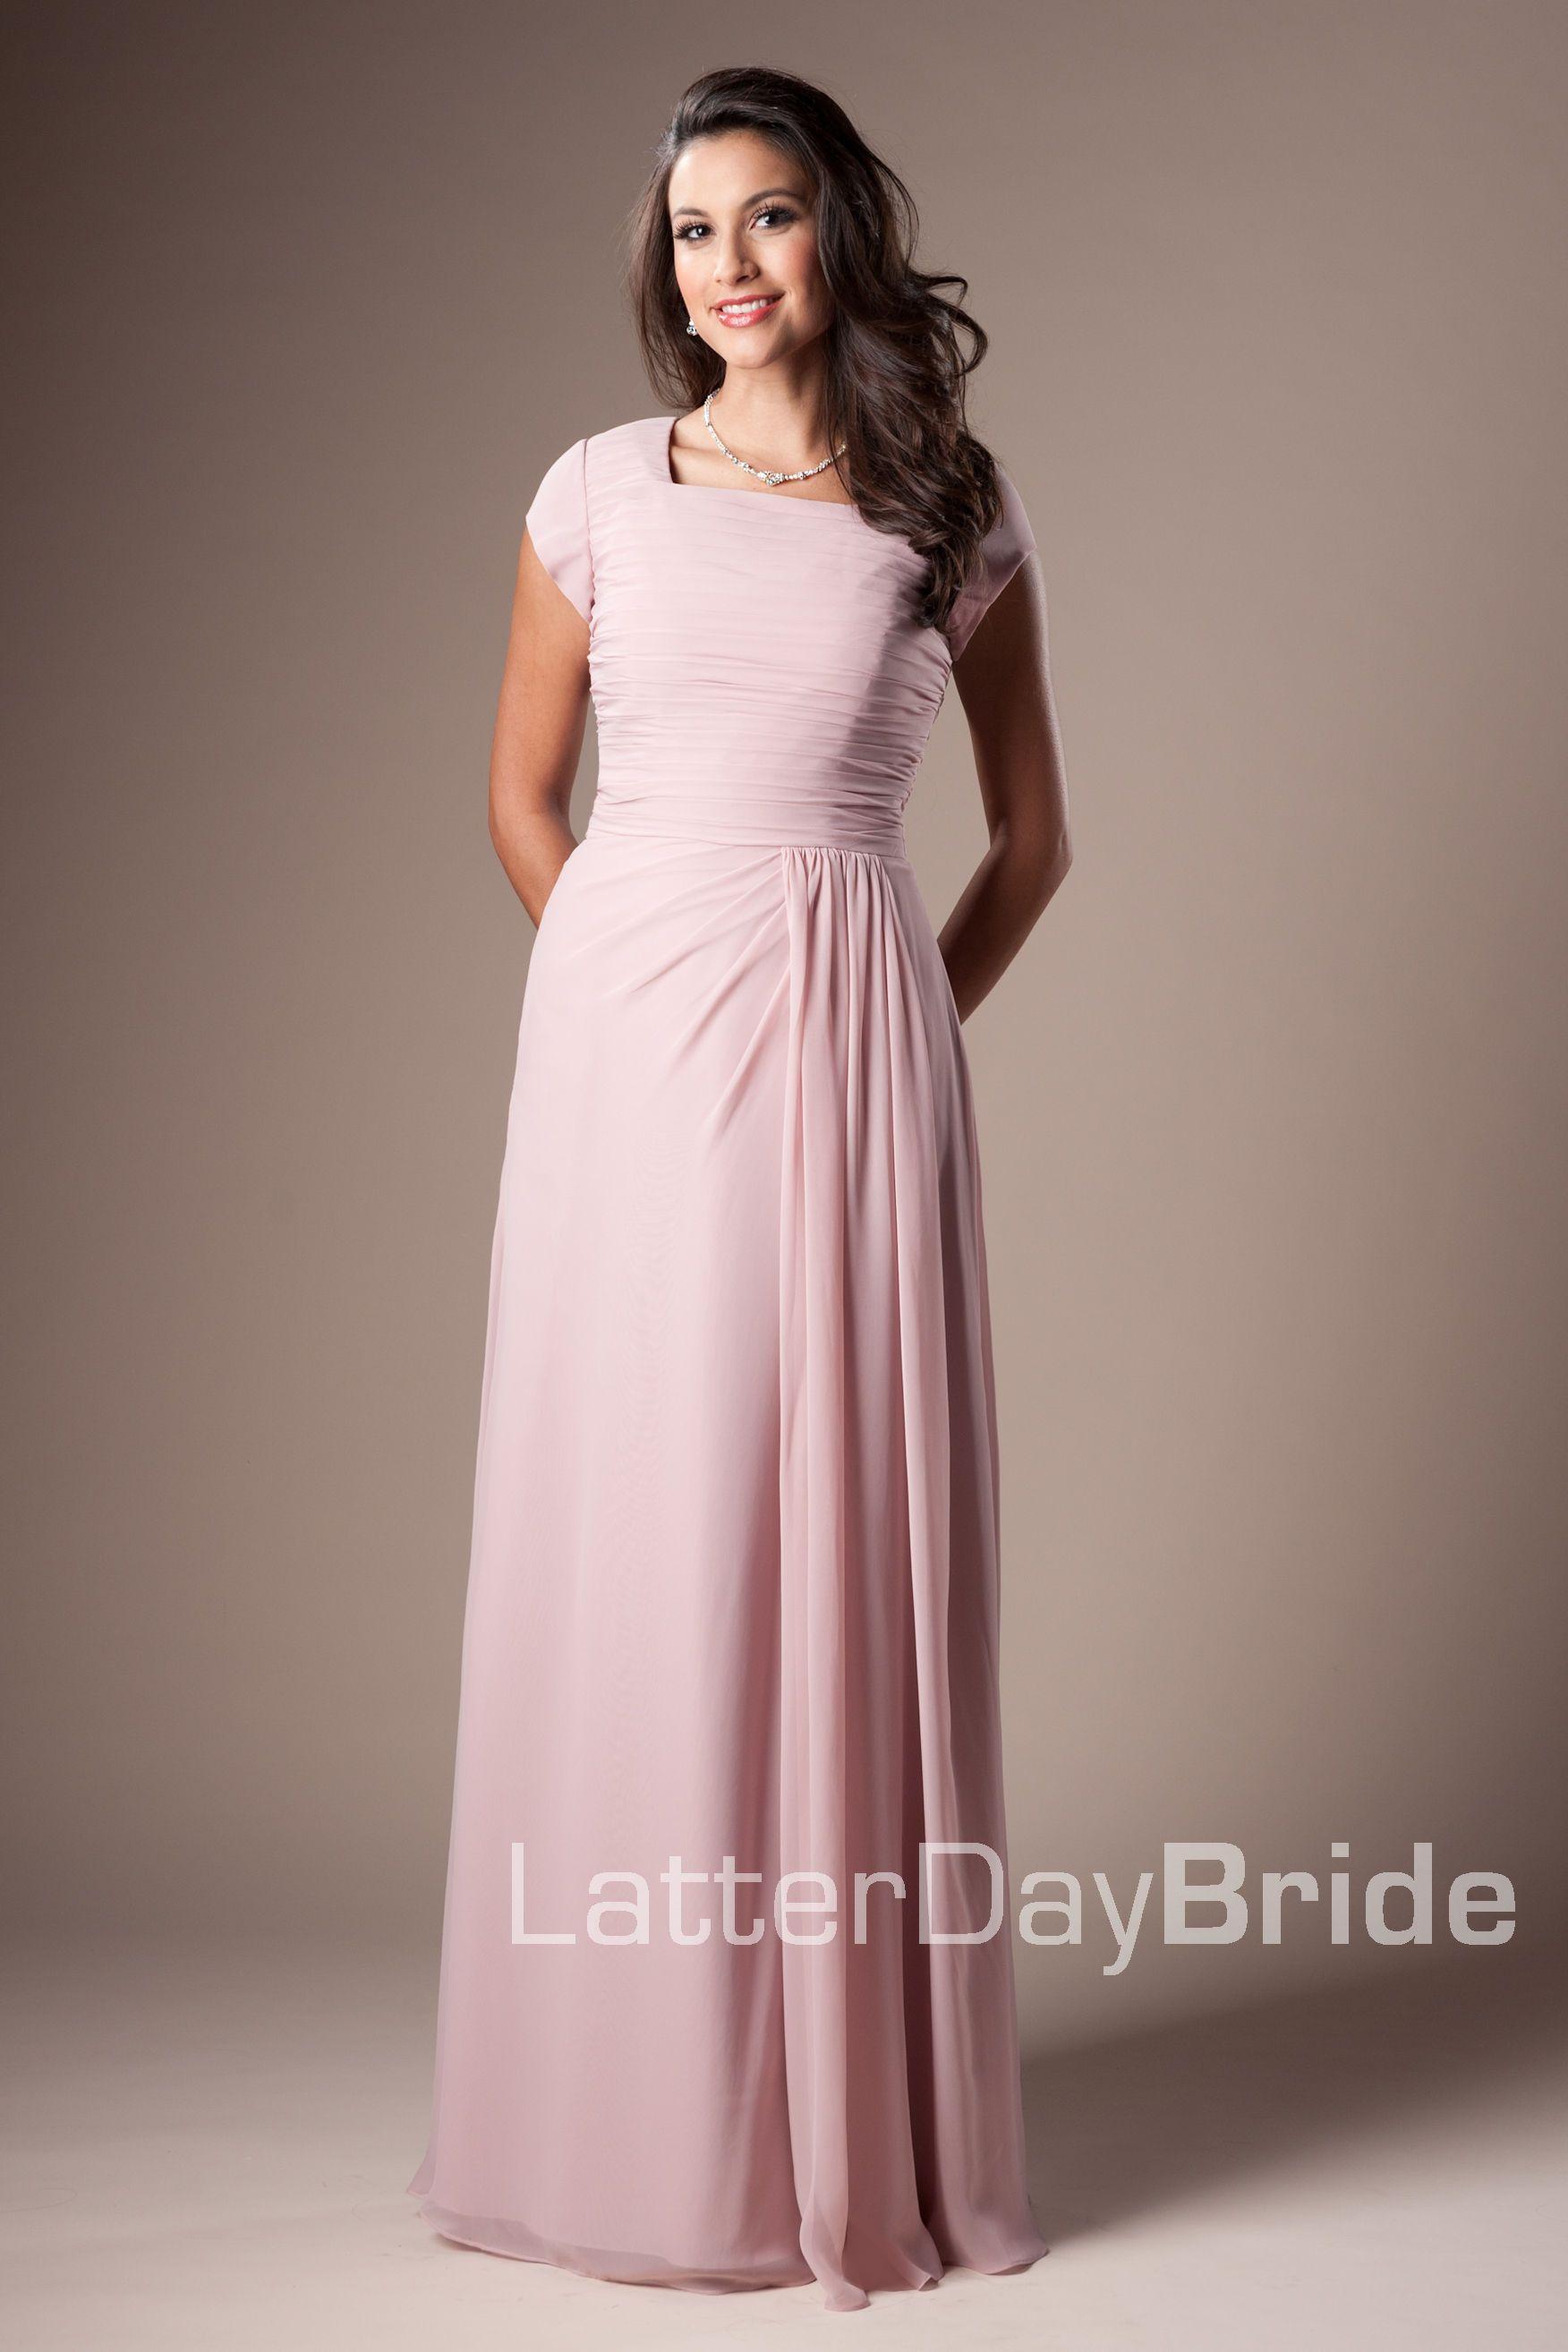 Bridesmaid Prom Shaelyn Latterdaybride Prom Modest Mormon Lds Bridesmaid Dress Prom Dresses Modest Modest Wedding Dresses Dresses [ 2628 x 1752 Pixel ]